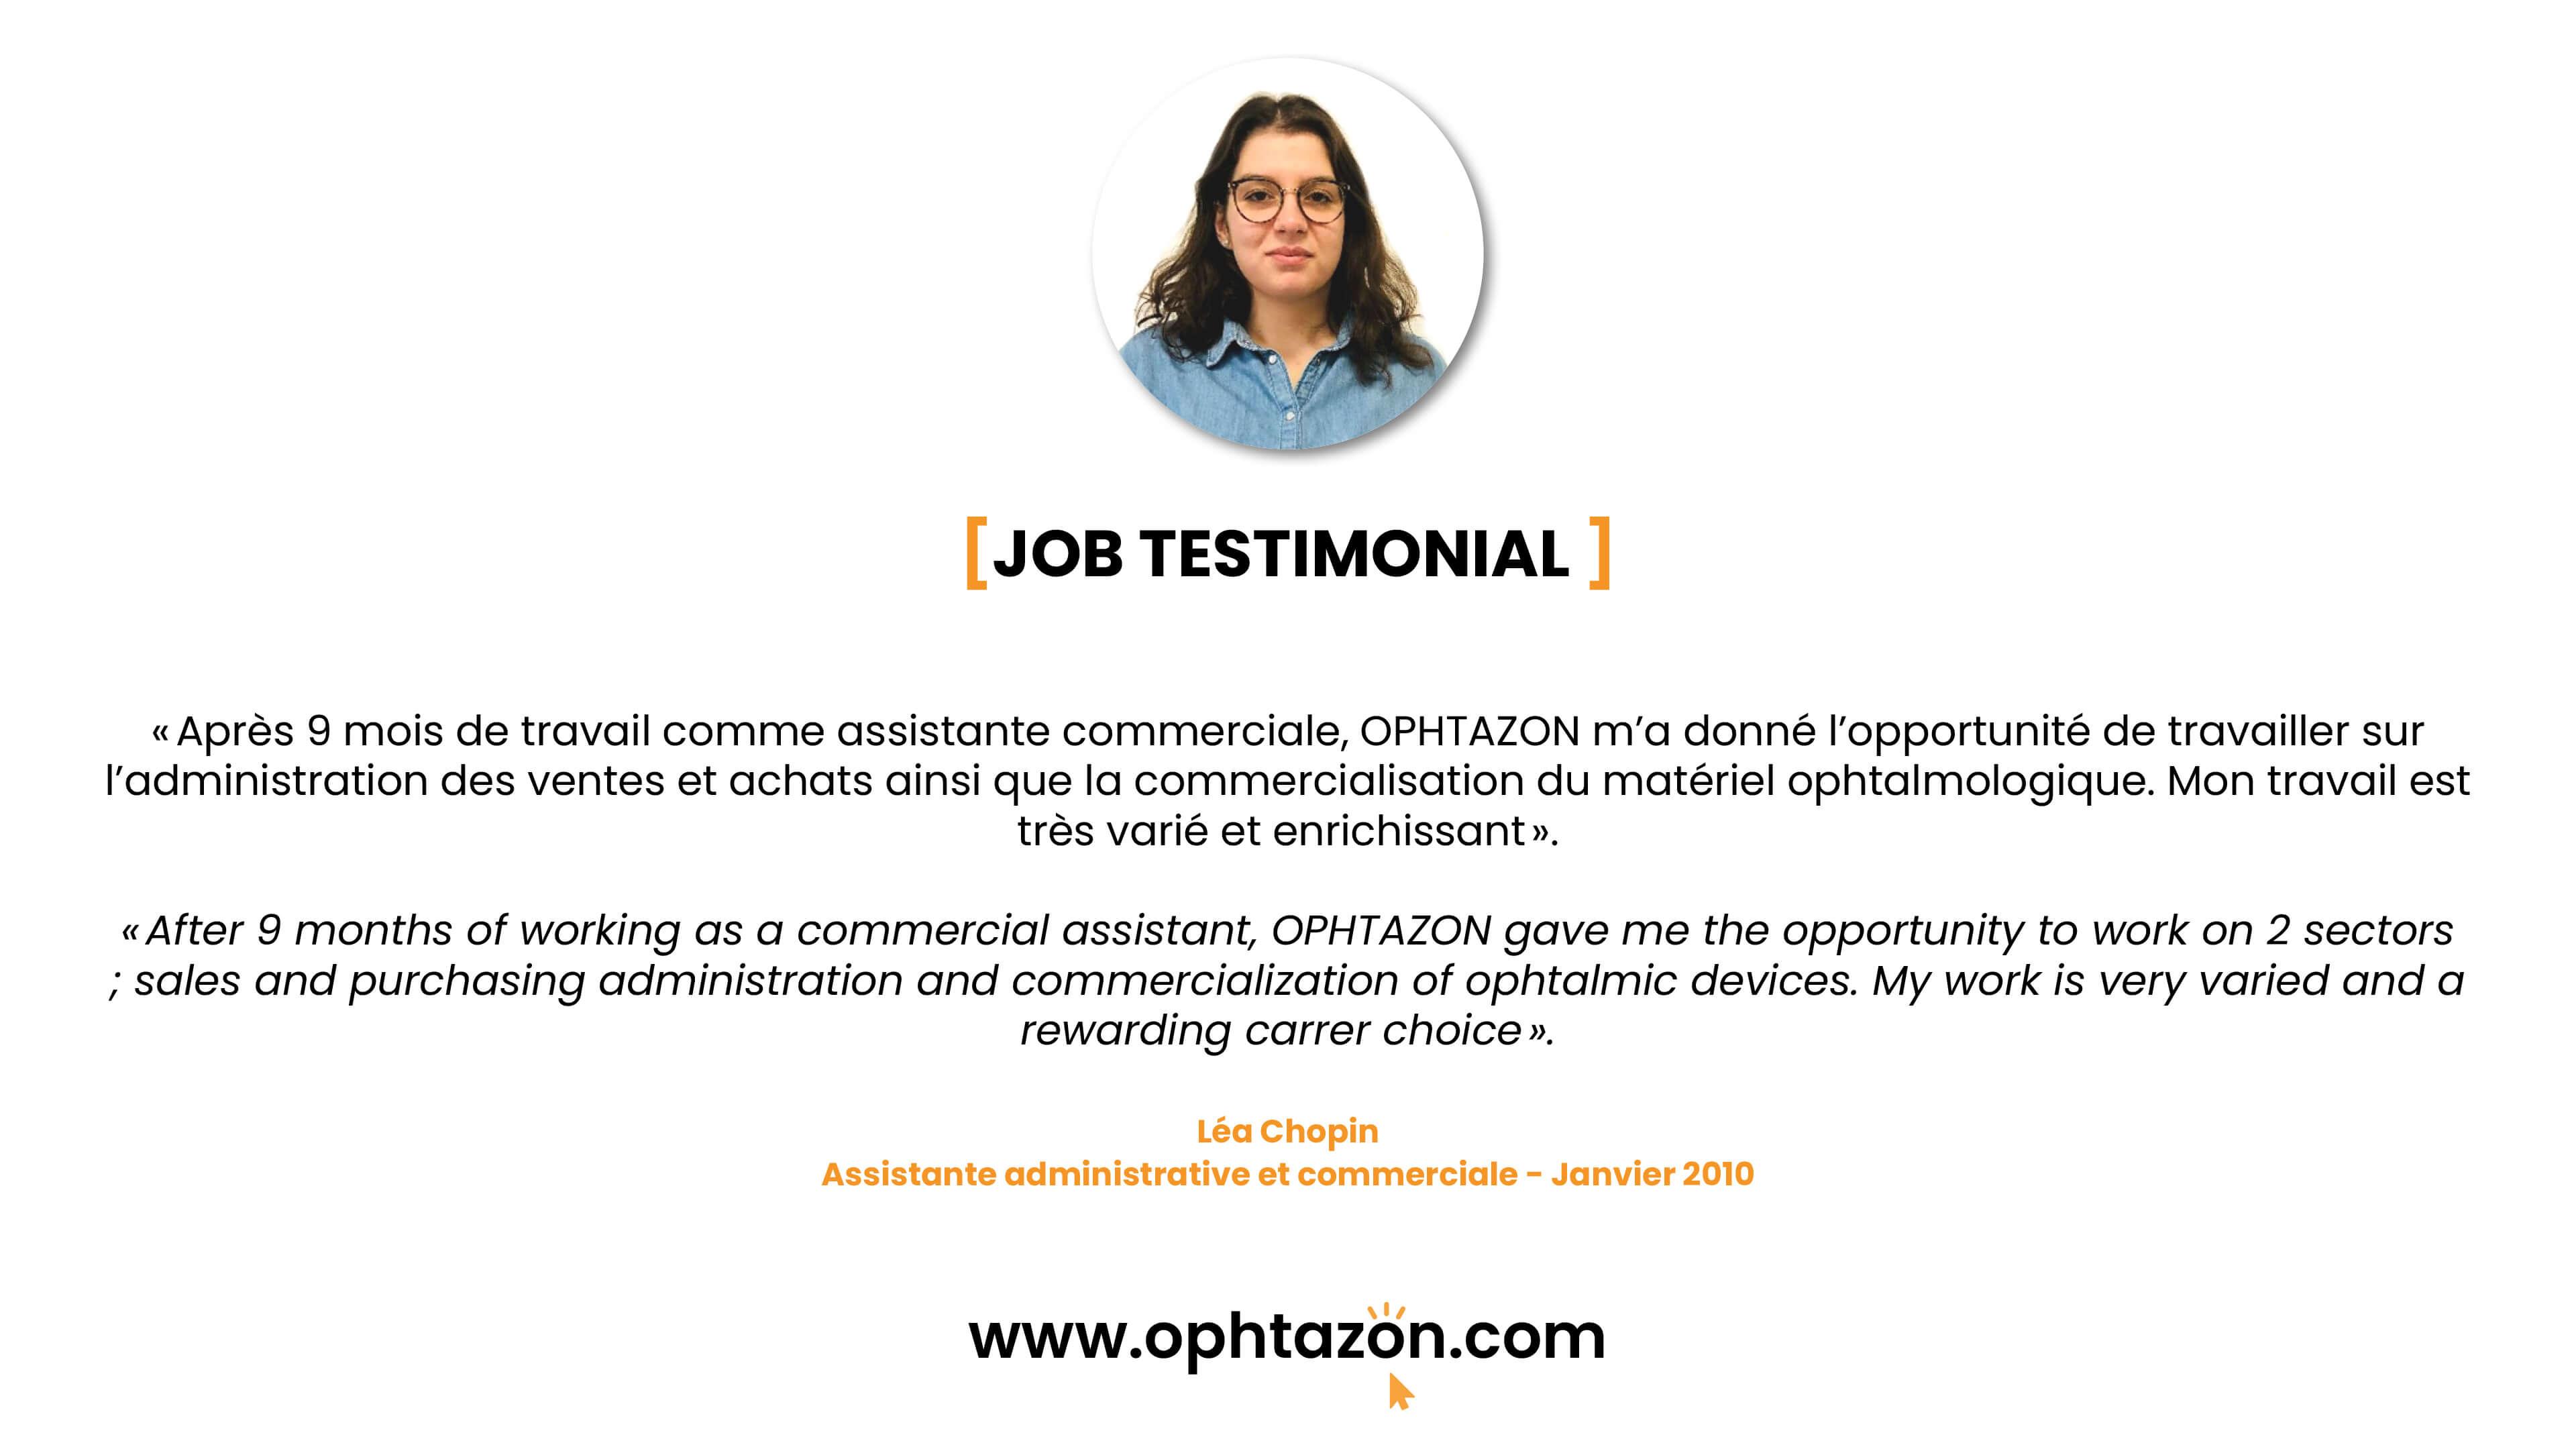 Job testimonial